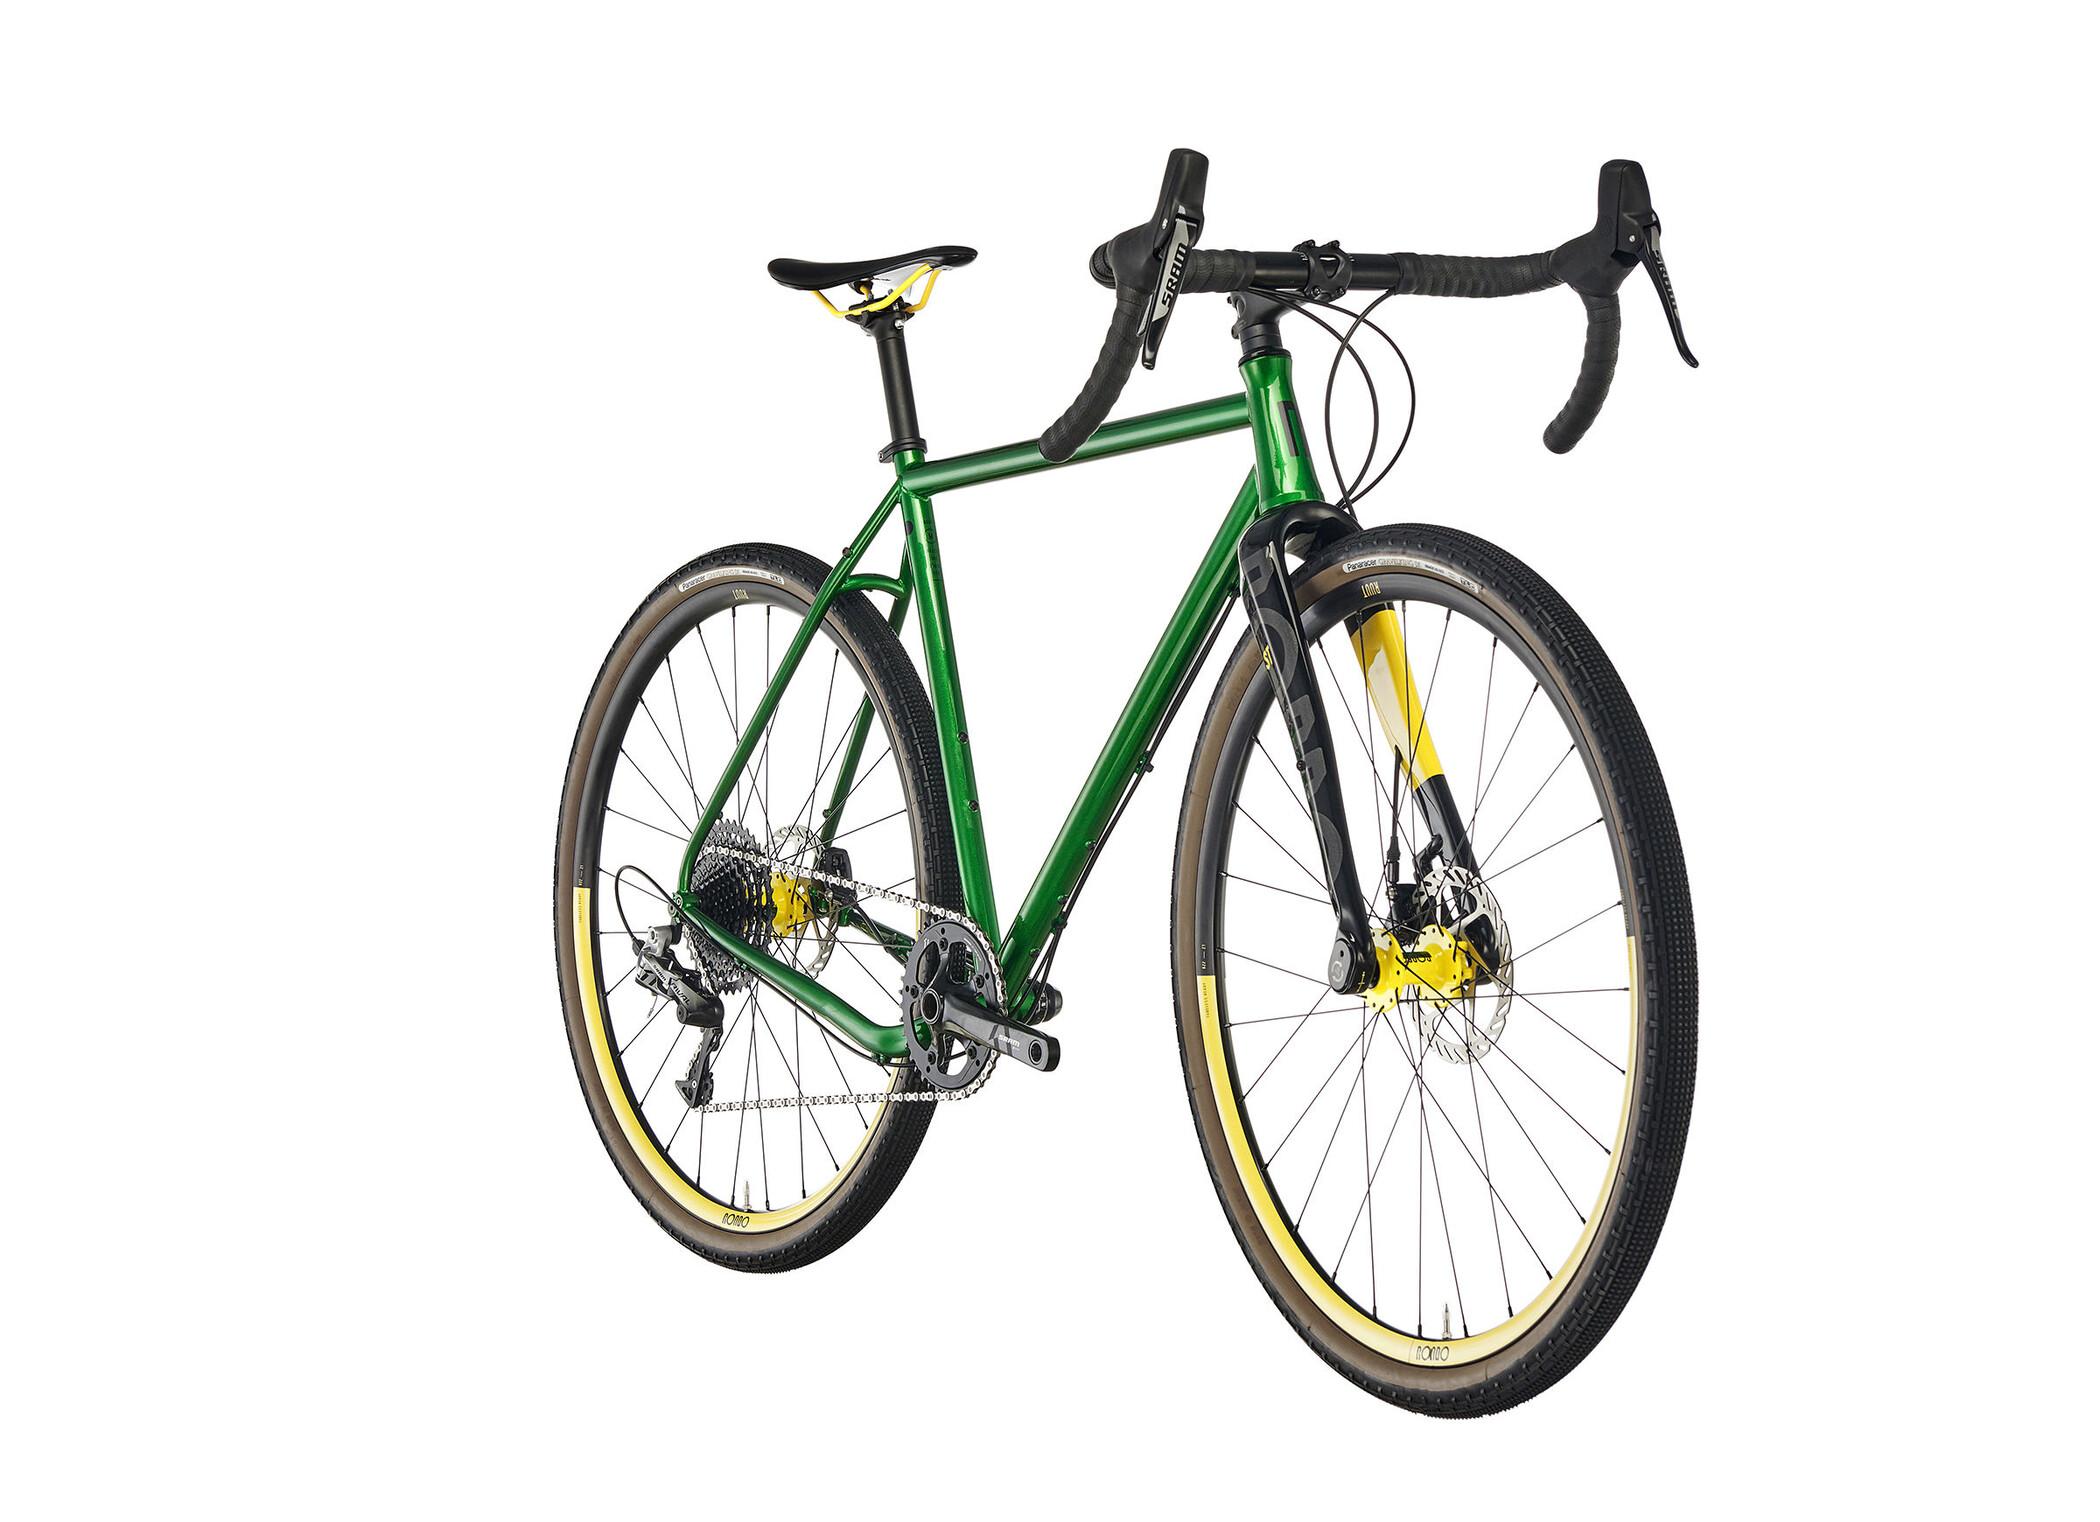 RONDO Ruut ST Gravel Plus Cyclocross grøn (2019)   Cross